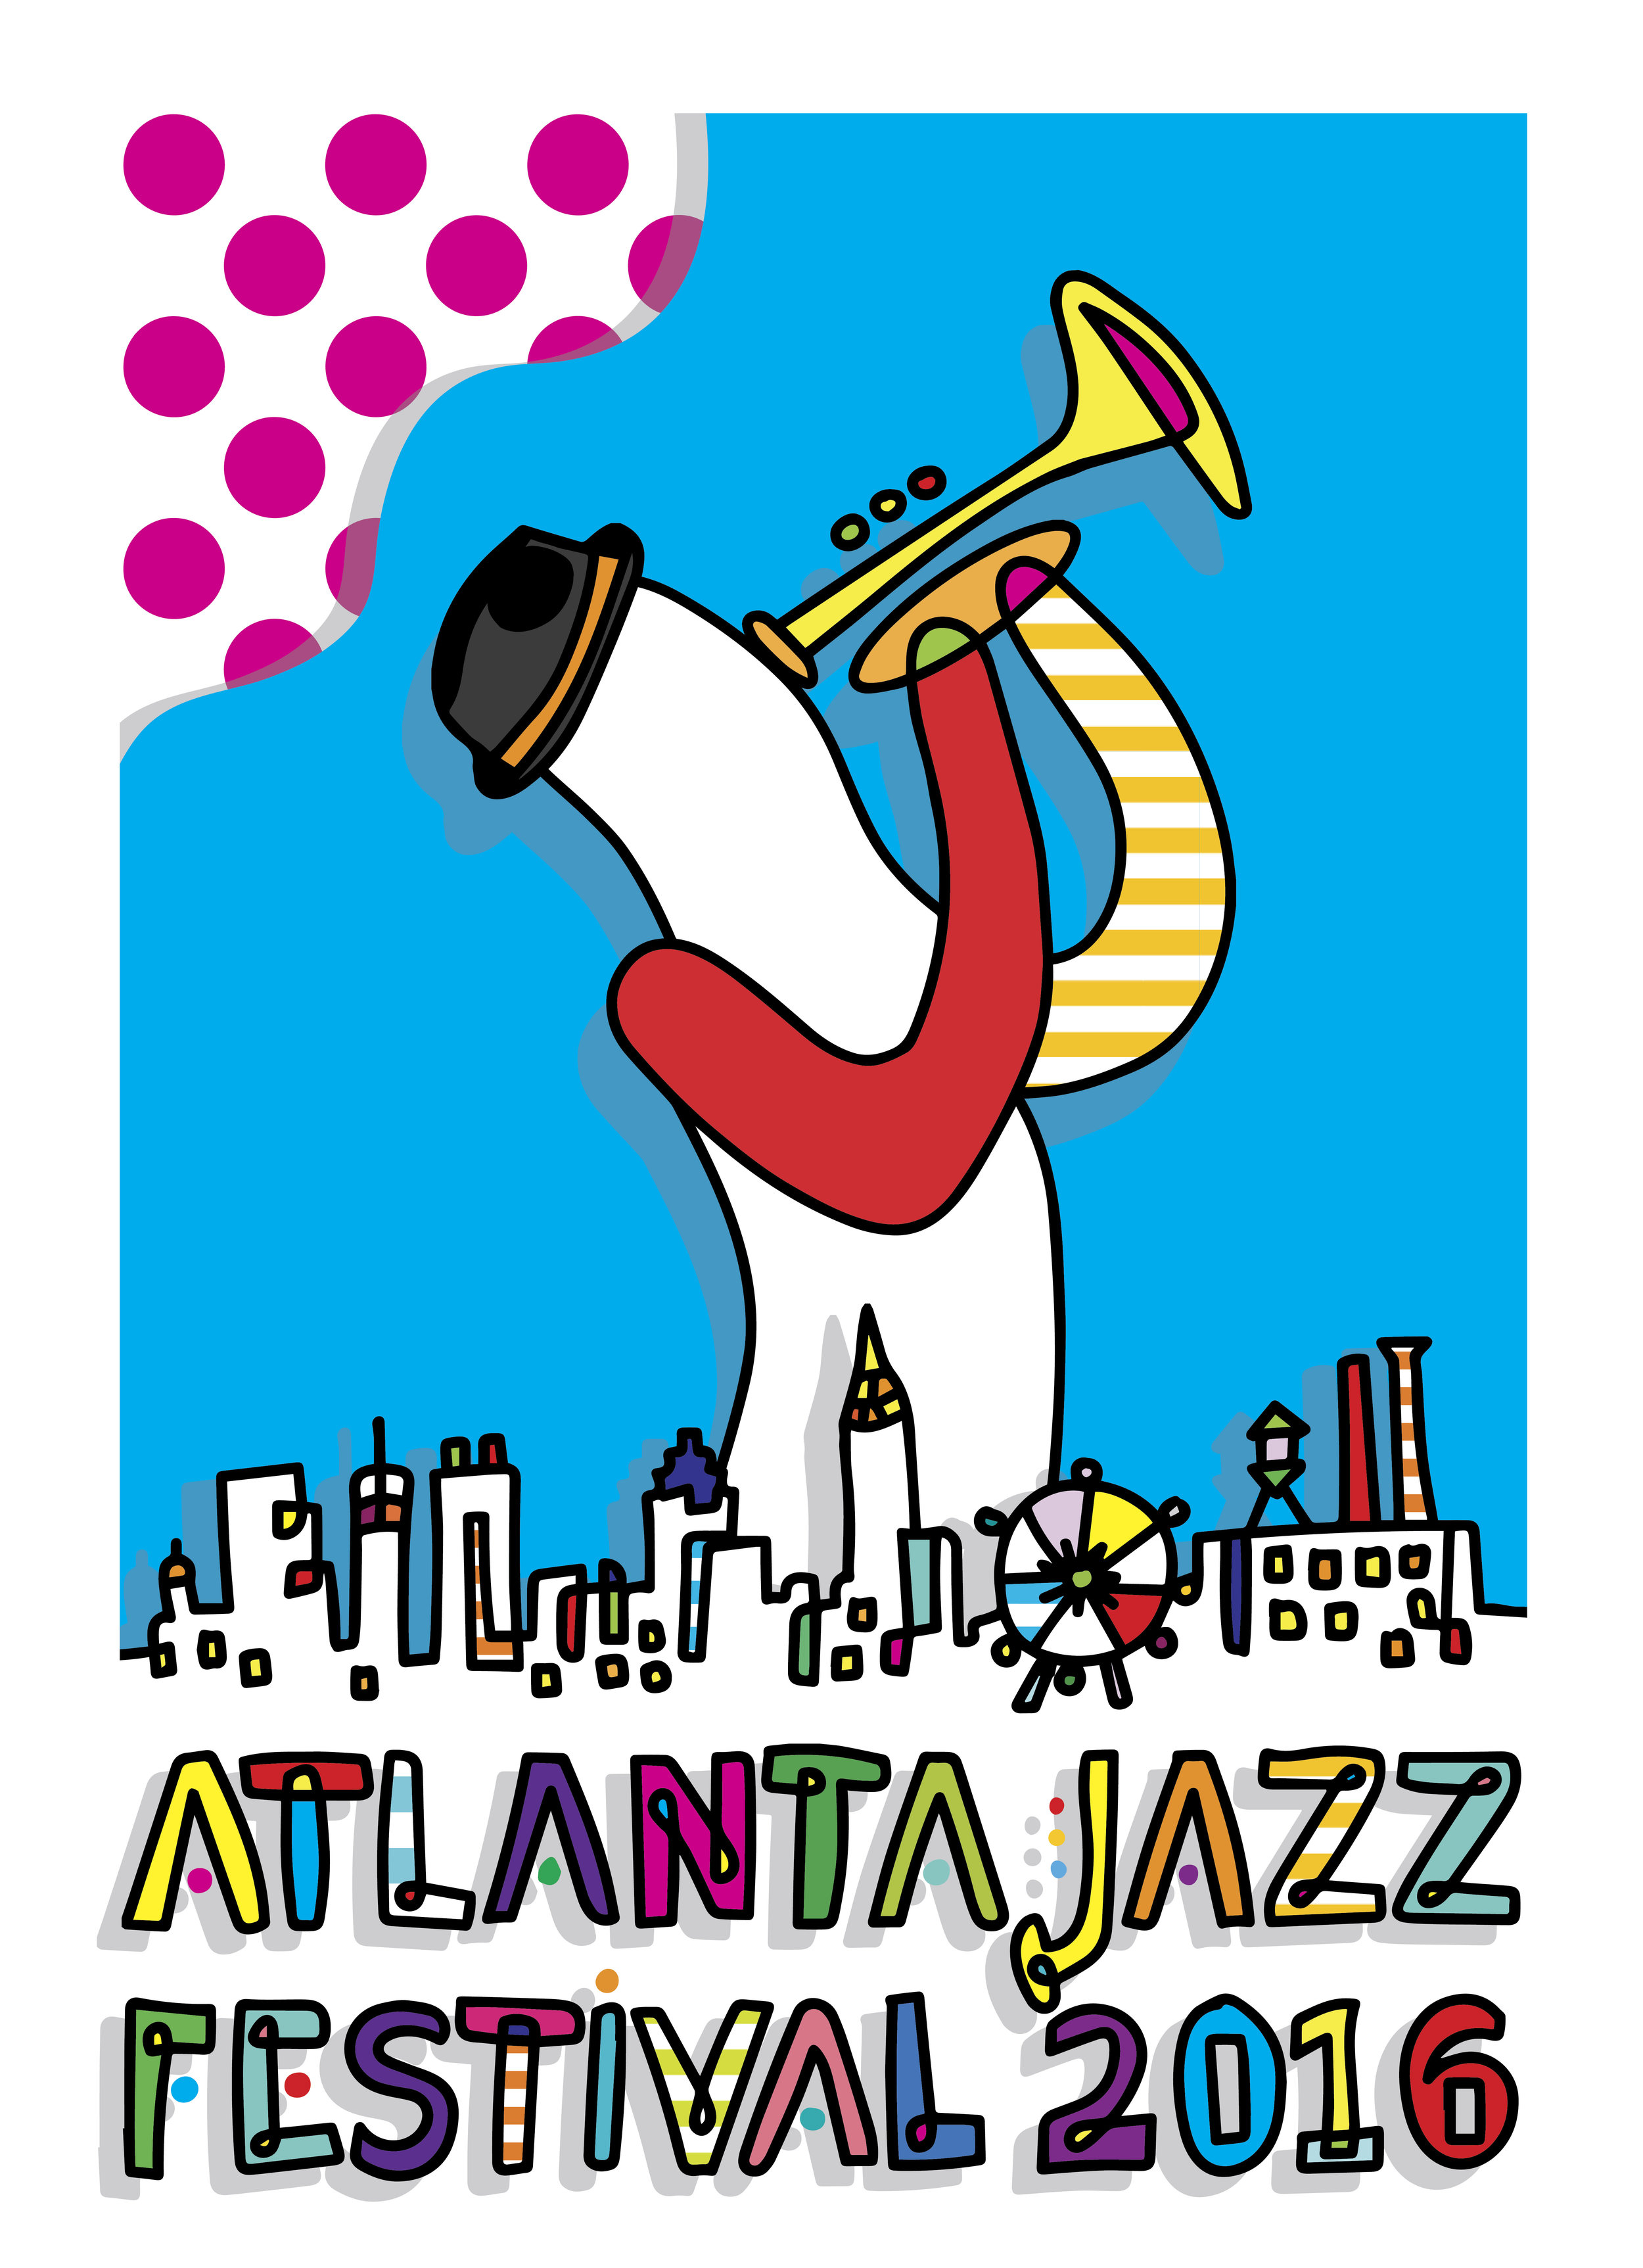 Atlanta Jazz Festival Poster  for  City of Atlanta Office of Cultural Affairs , 2016